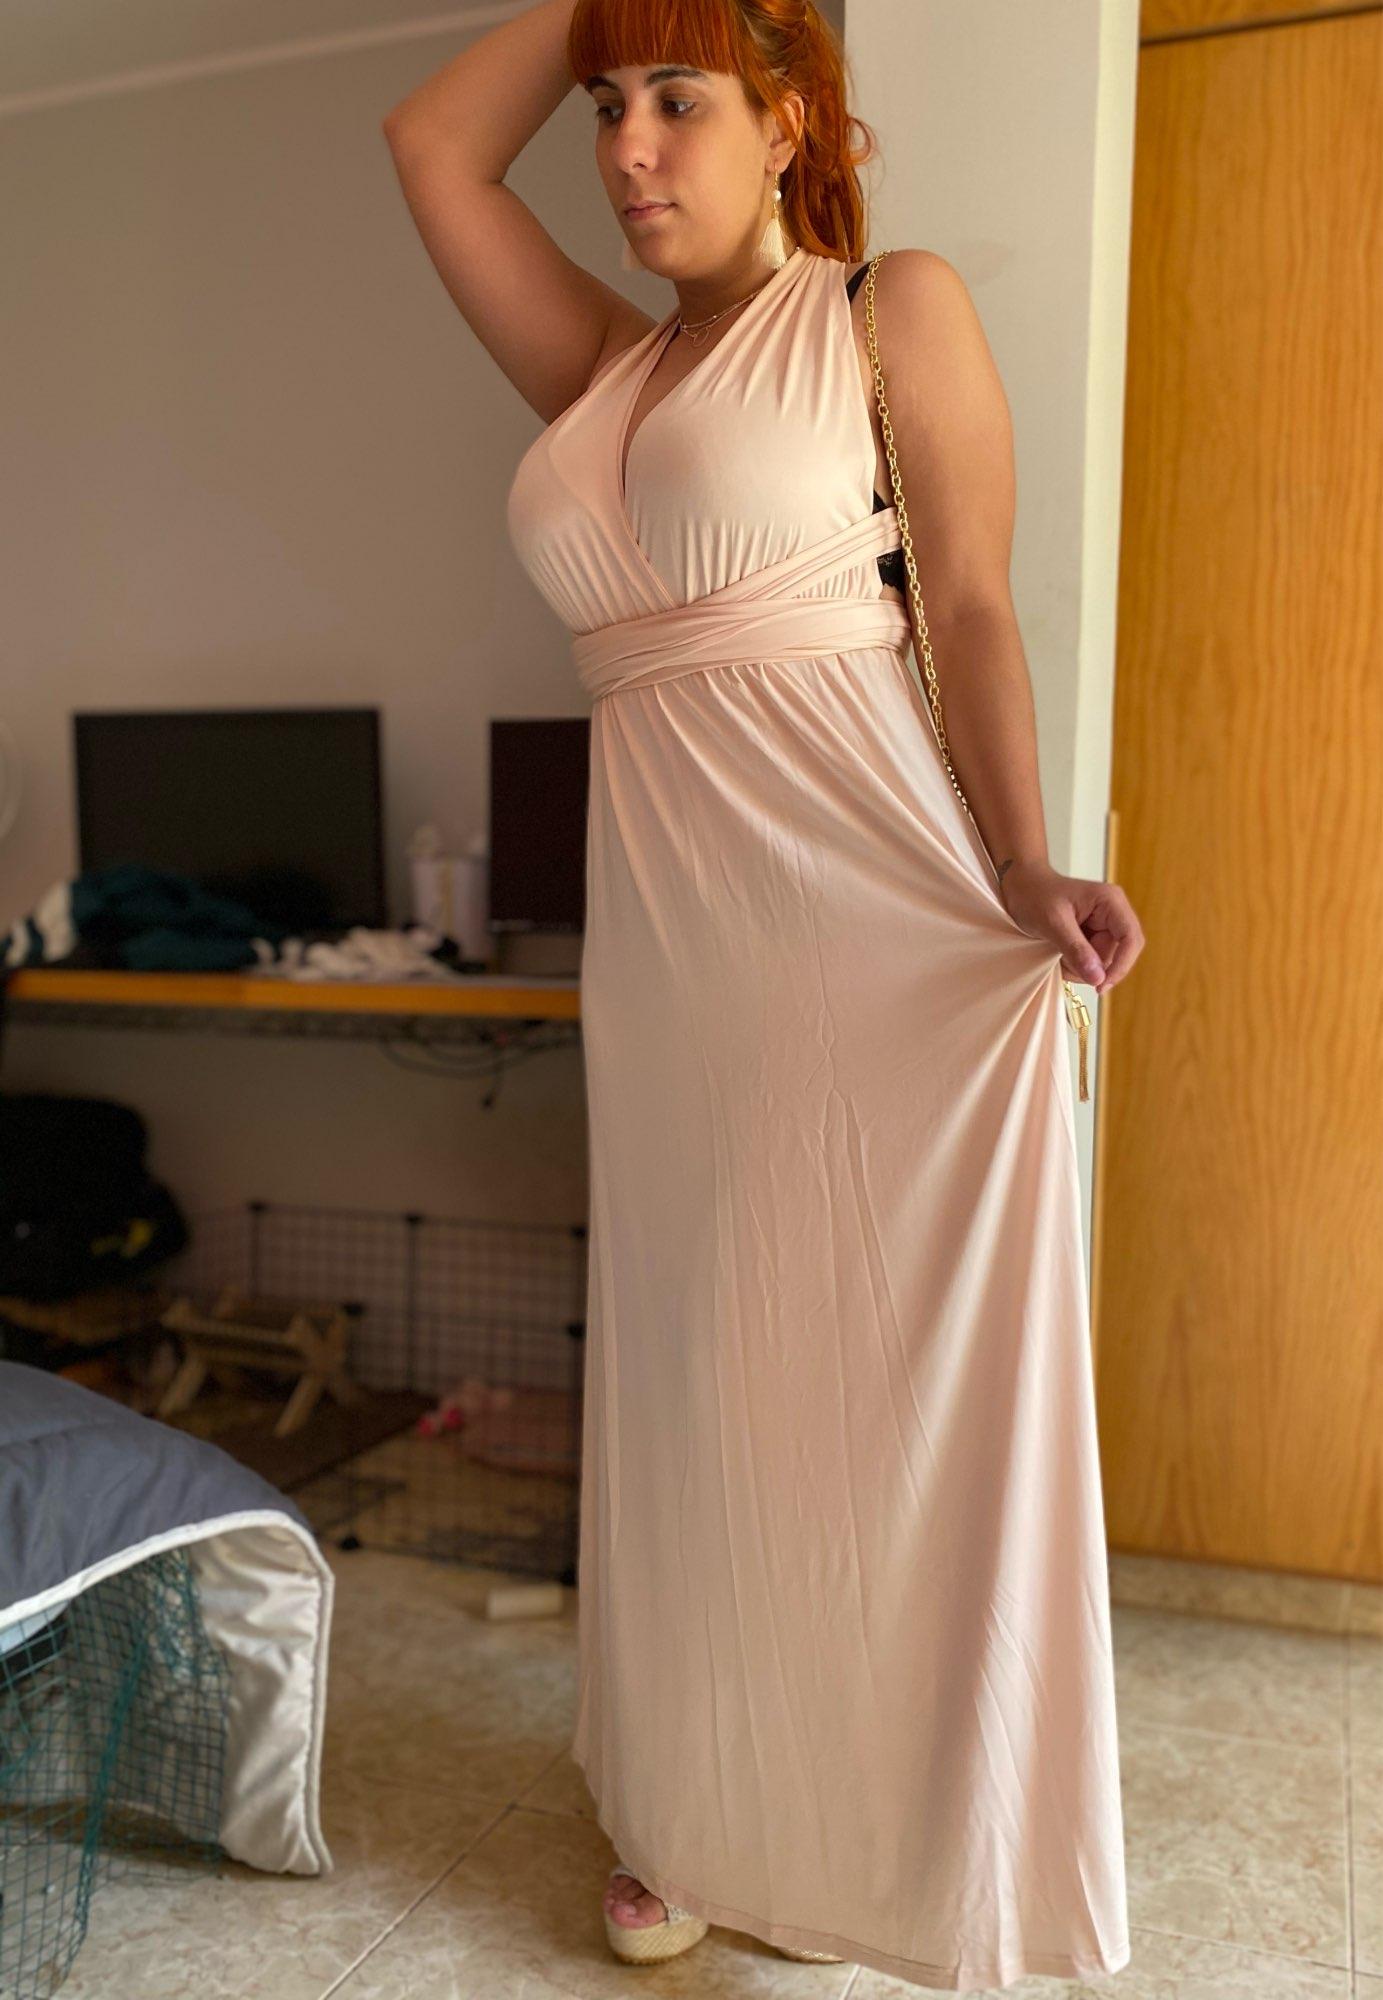 Sexy Women Multiway Wrap Convertible Boho Maxi Club Red Dress Bandage Long Dress Party Bridesmaids Infinity Robe Longue Femme|Dresses|   - AliExpress